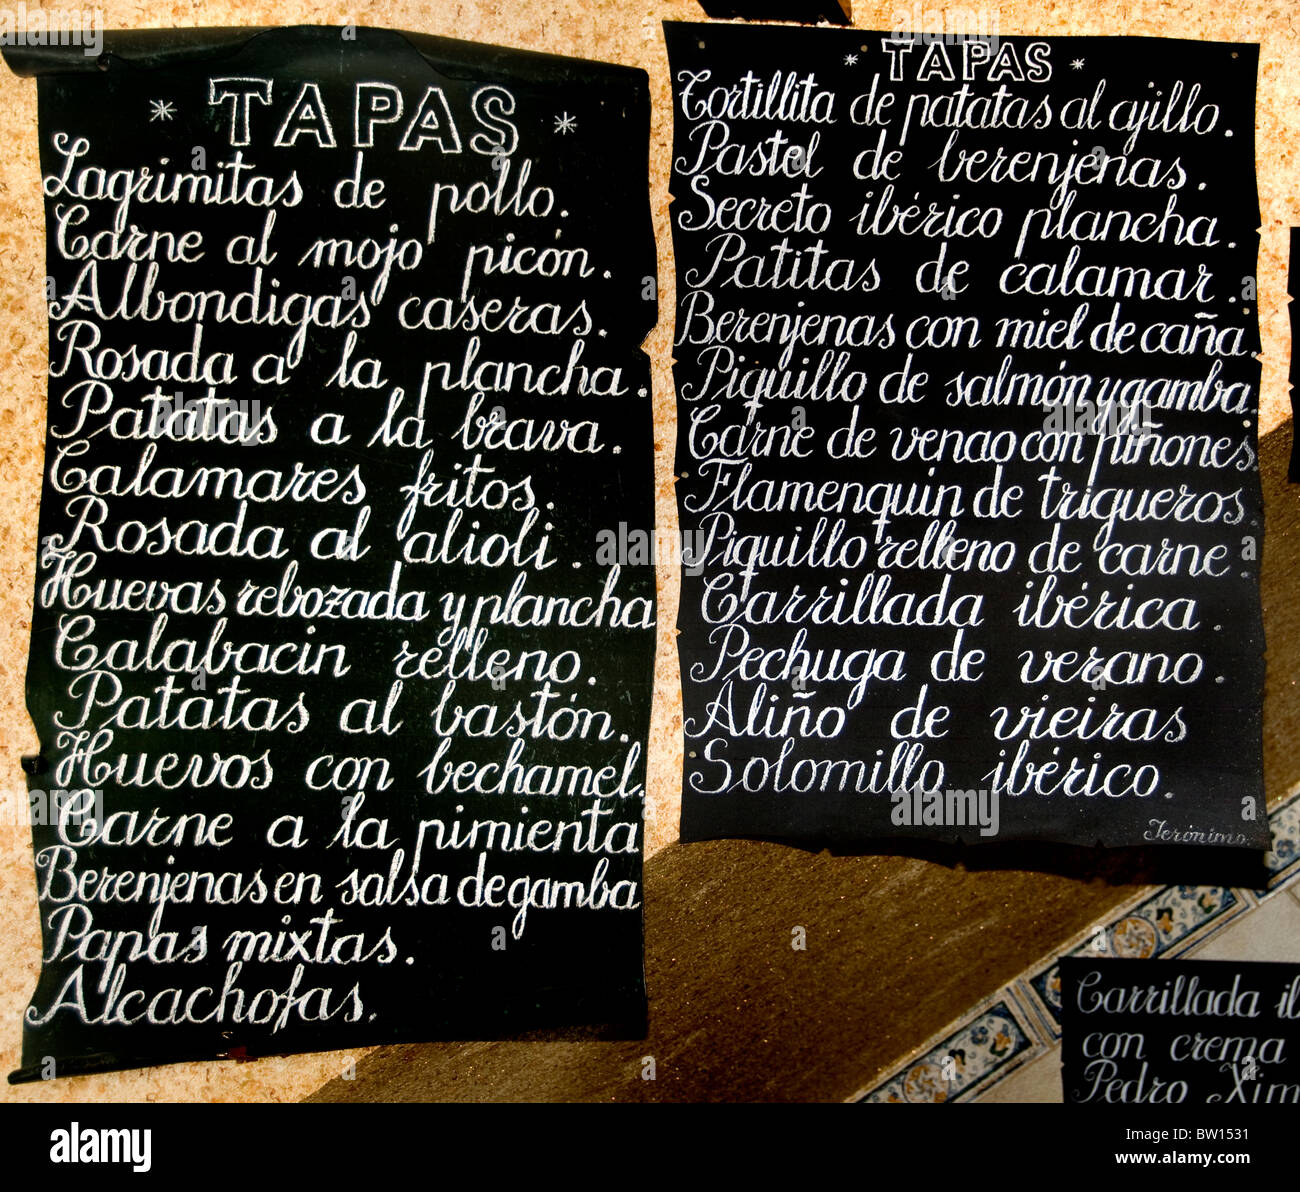 España Español Menú de tapas de tapas bar pub restaurante Antequera Imagen De Stock